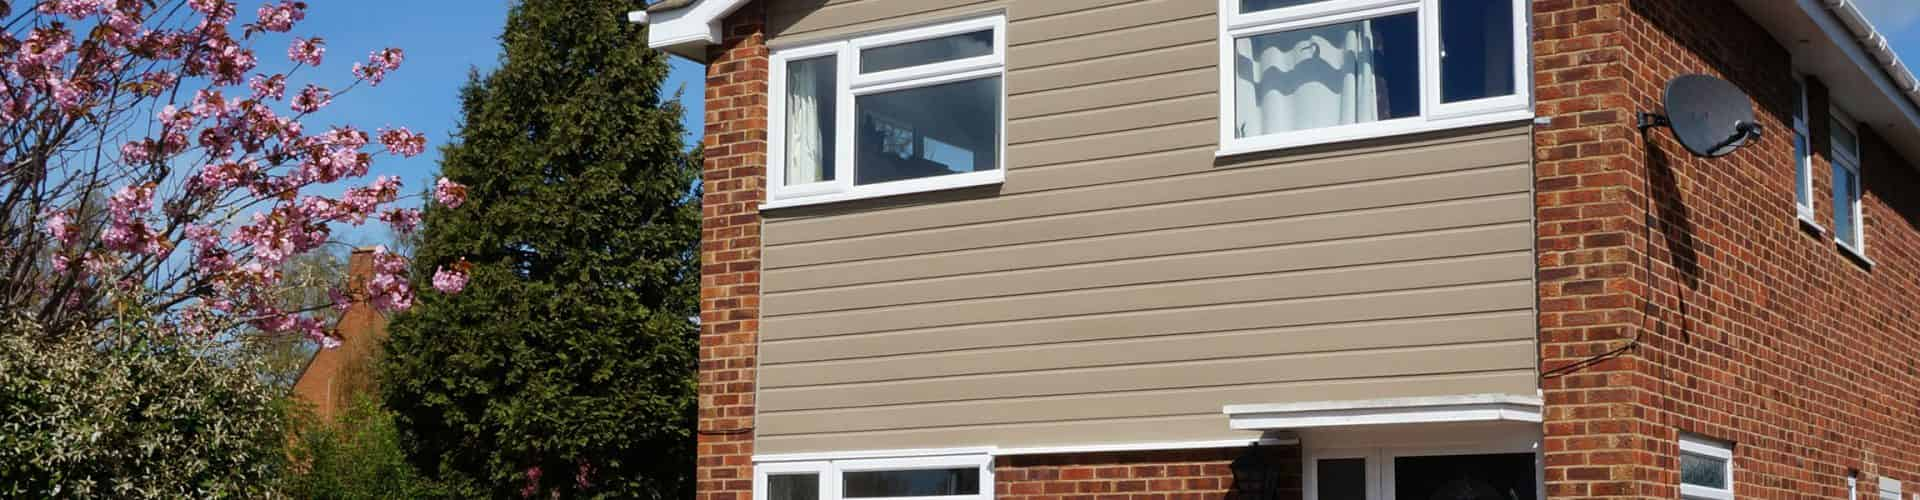 Can I Paint External Bay Window Tiles